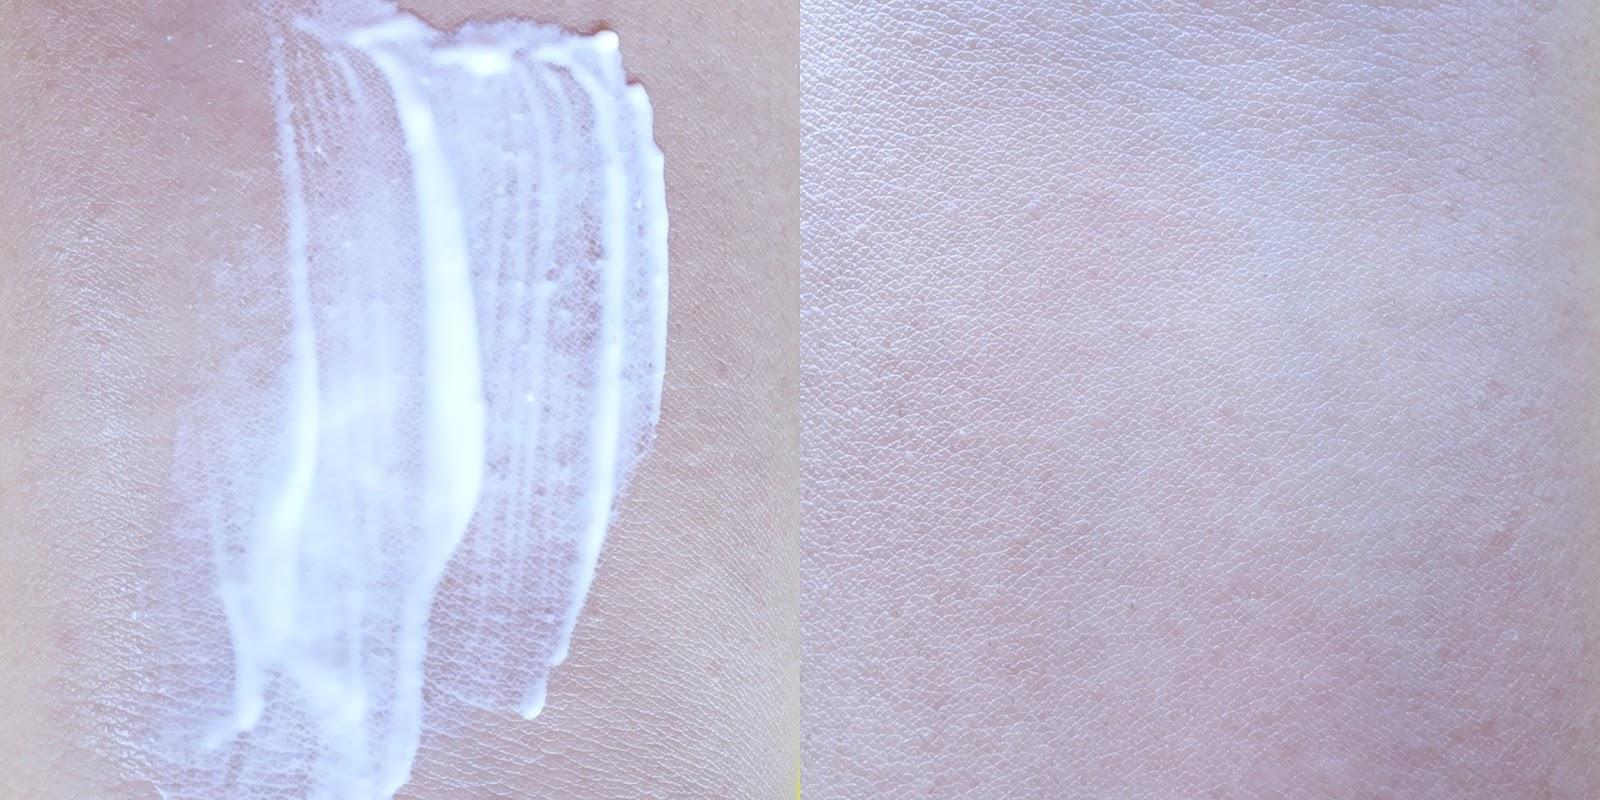 cetaphil-daily-facial-moisturizer-spf-15-pa